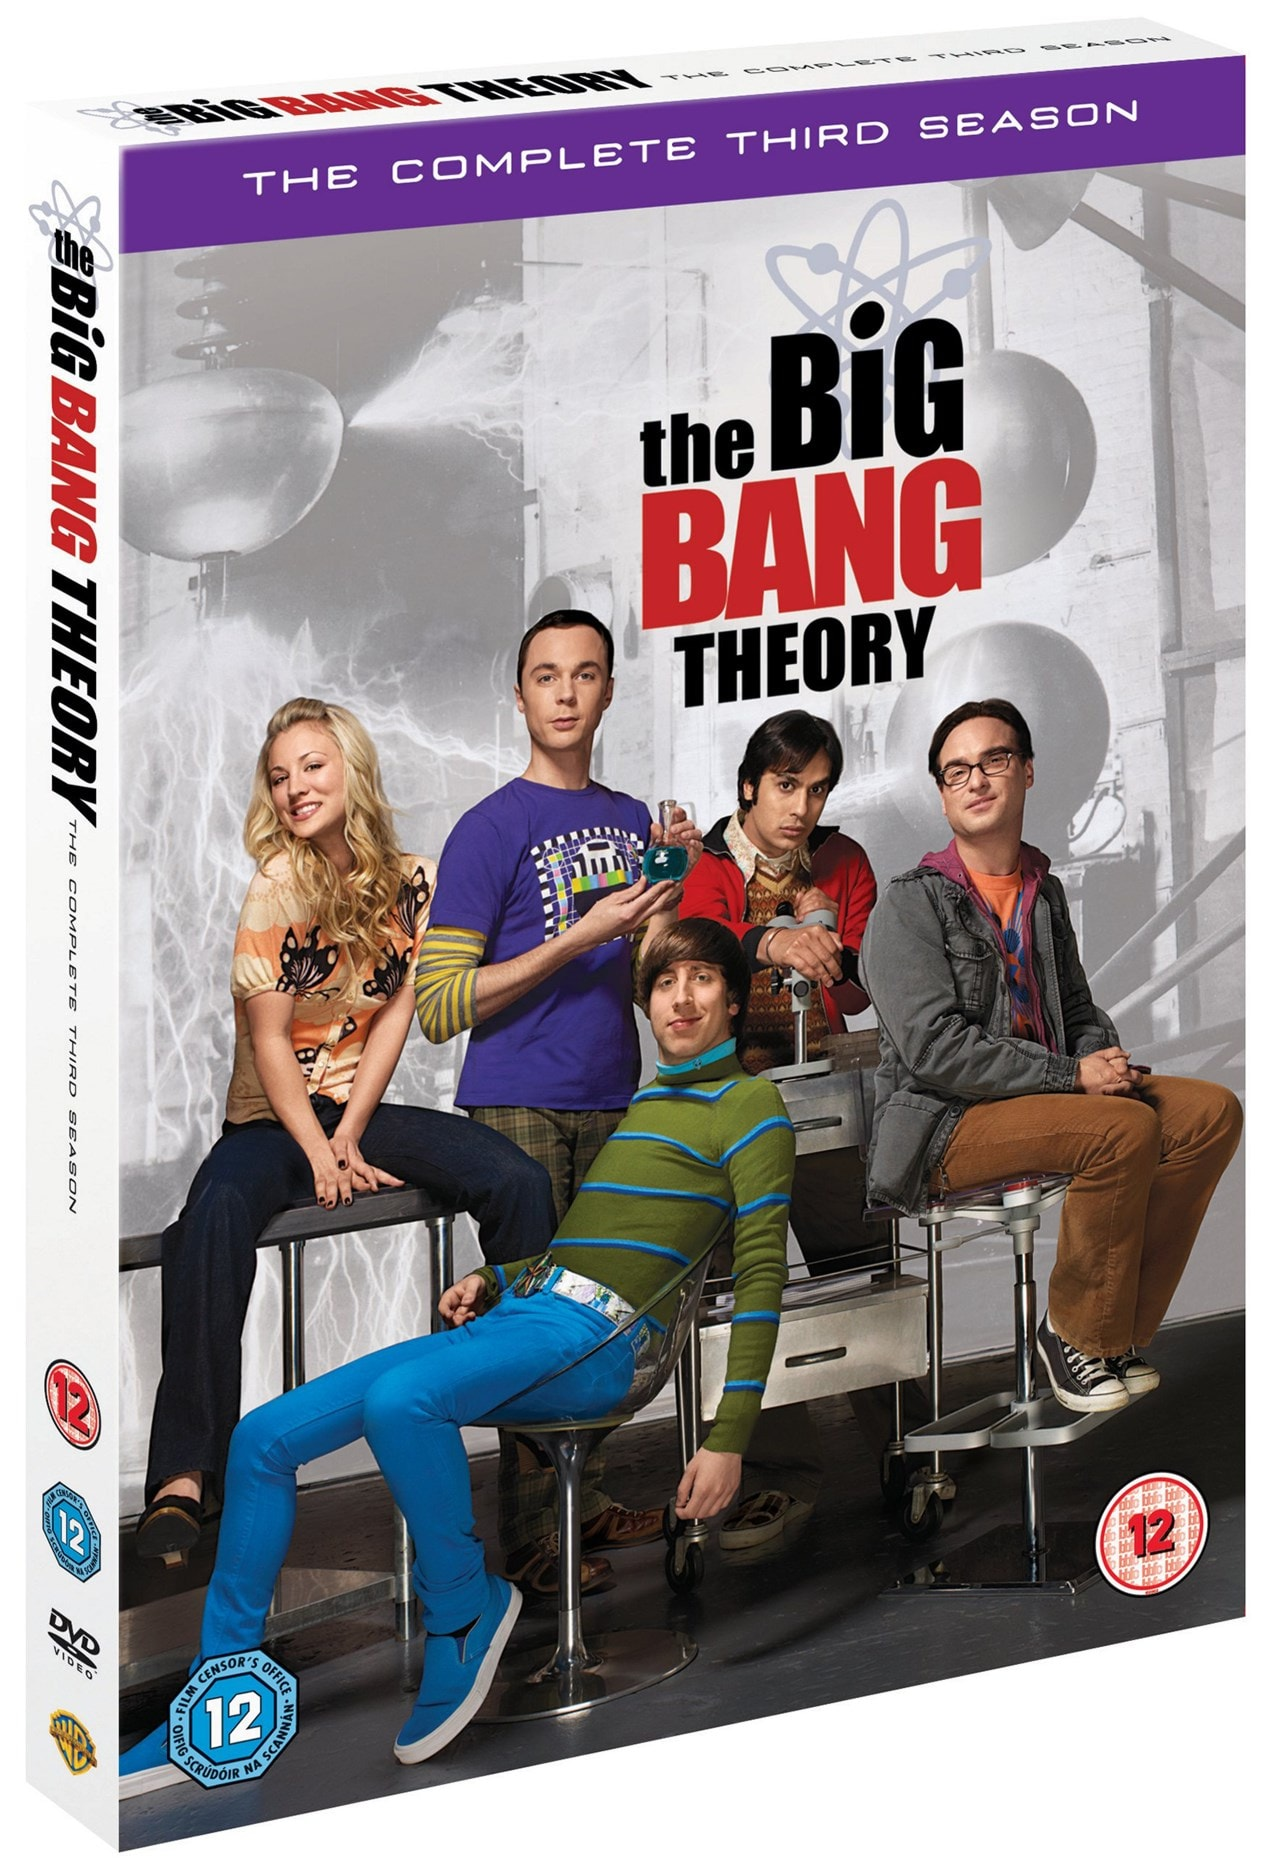 The Big Bang Theory: The Complete Third Season - 2